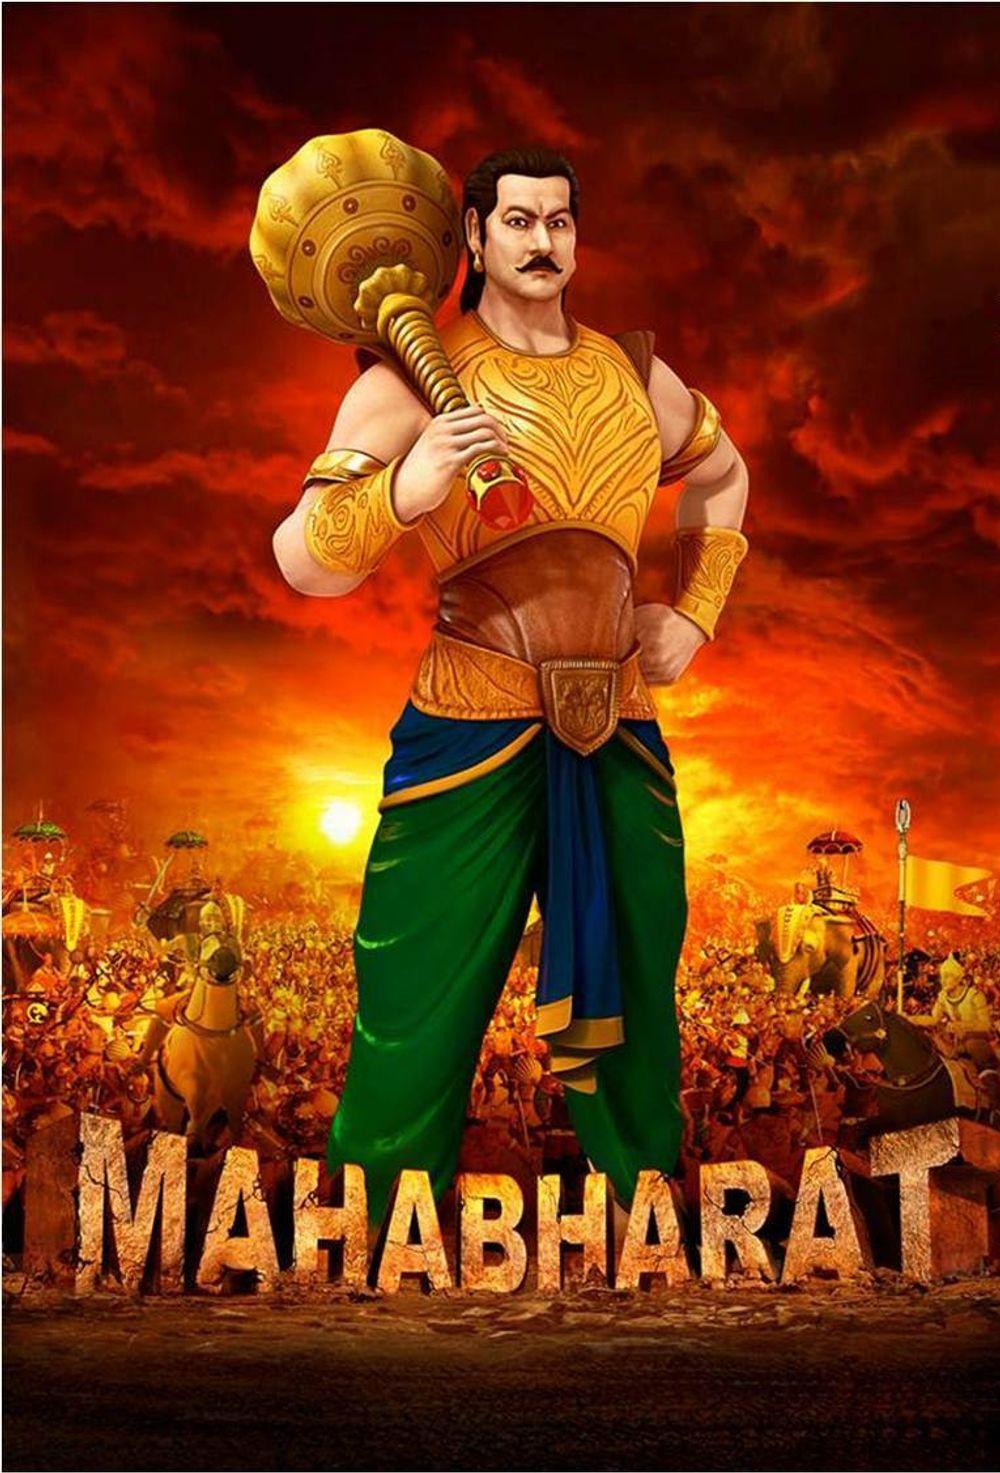 Mahabharat Movie Review